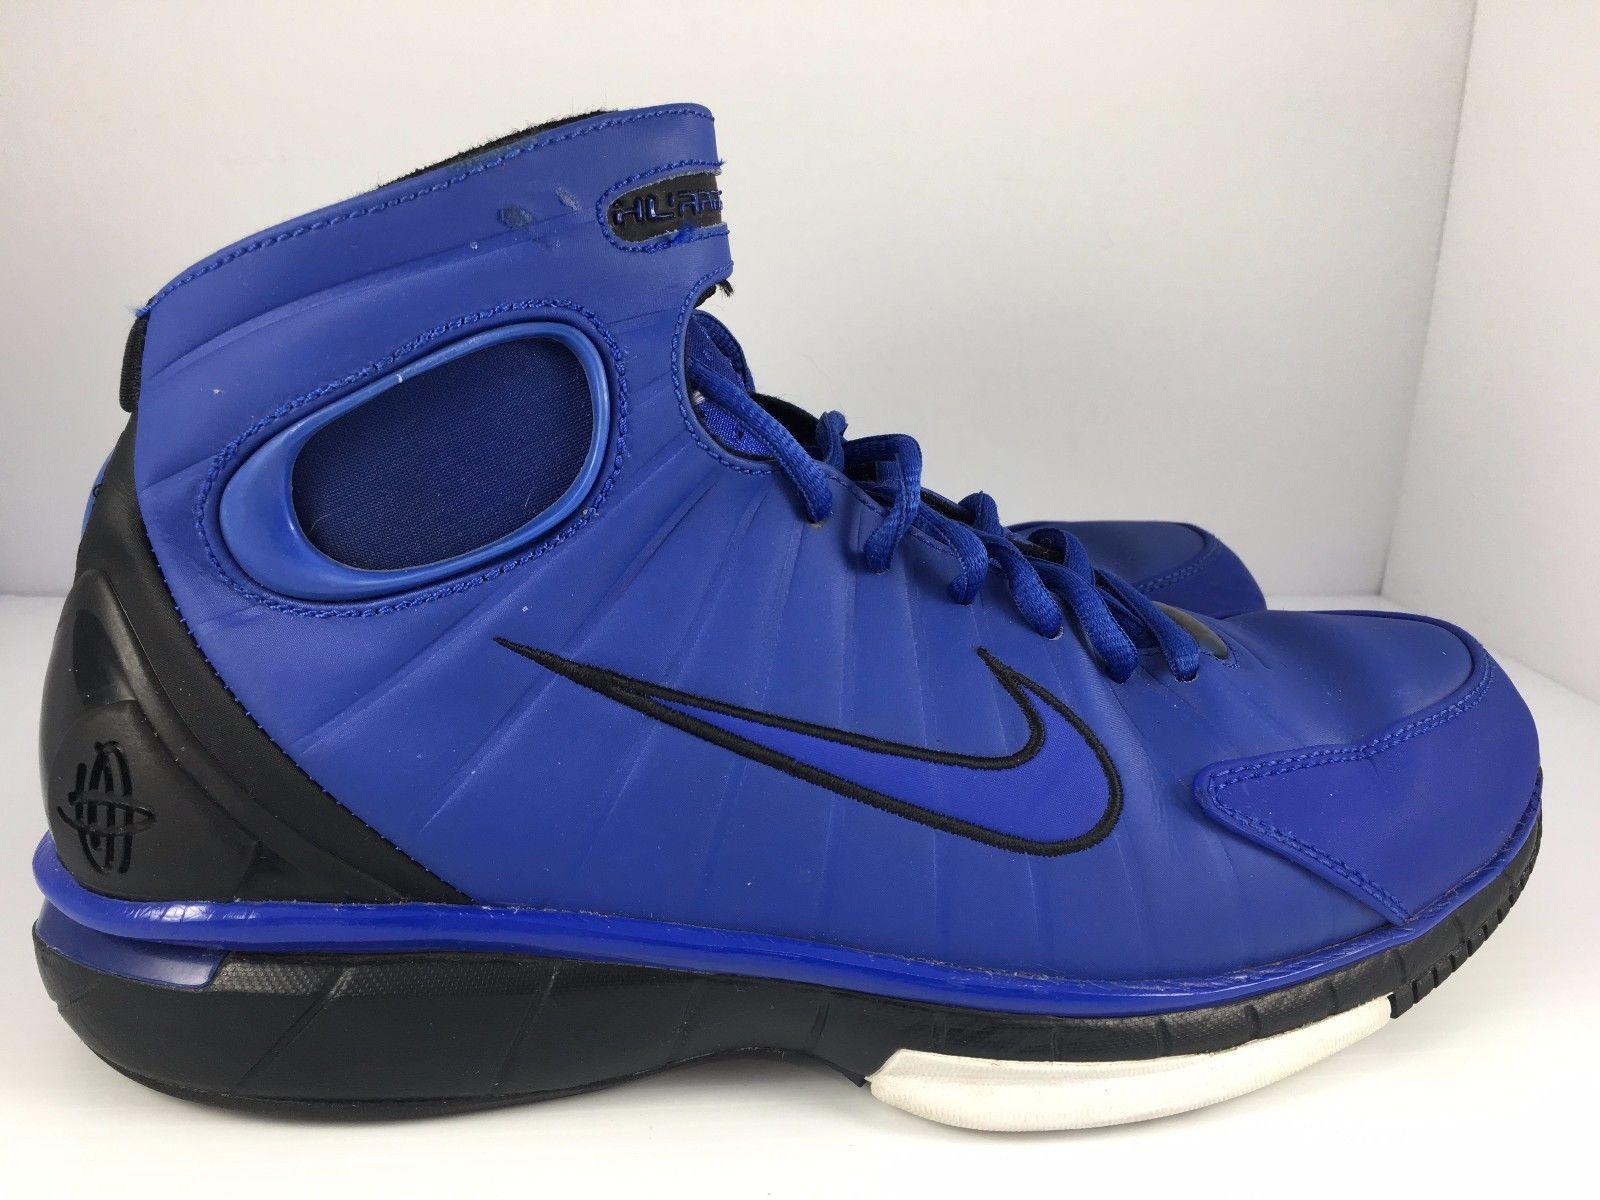 Nike Air Zoom Huarache Men US 8 Duke Blue + Black 511425-441 Kobe Sneakers